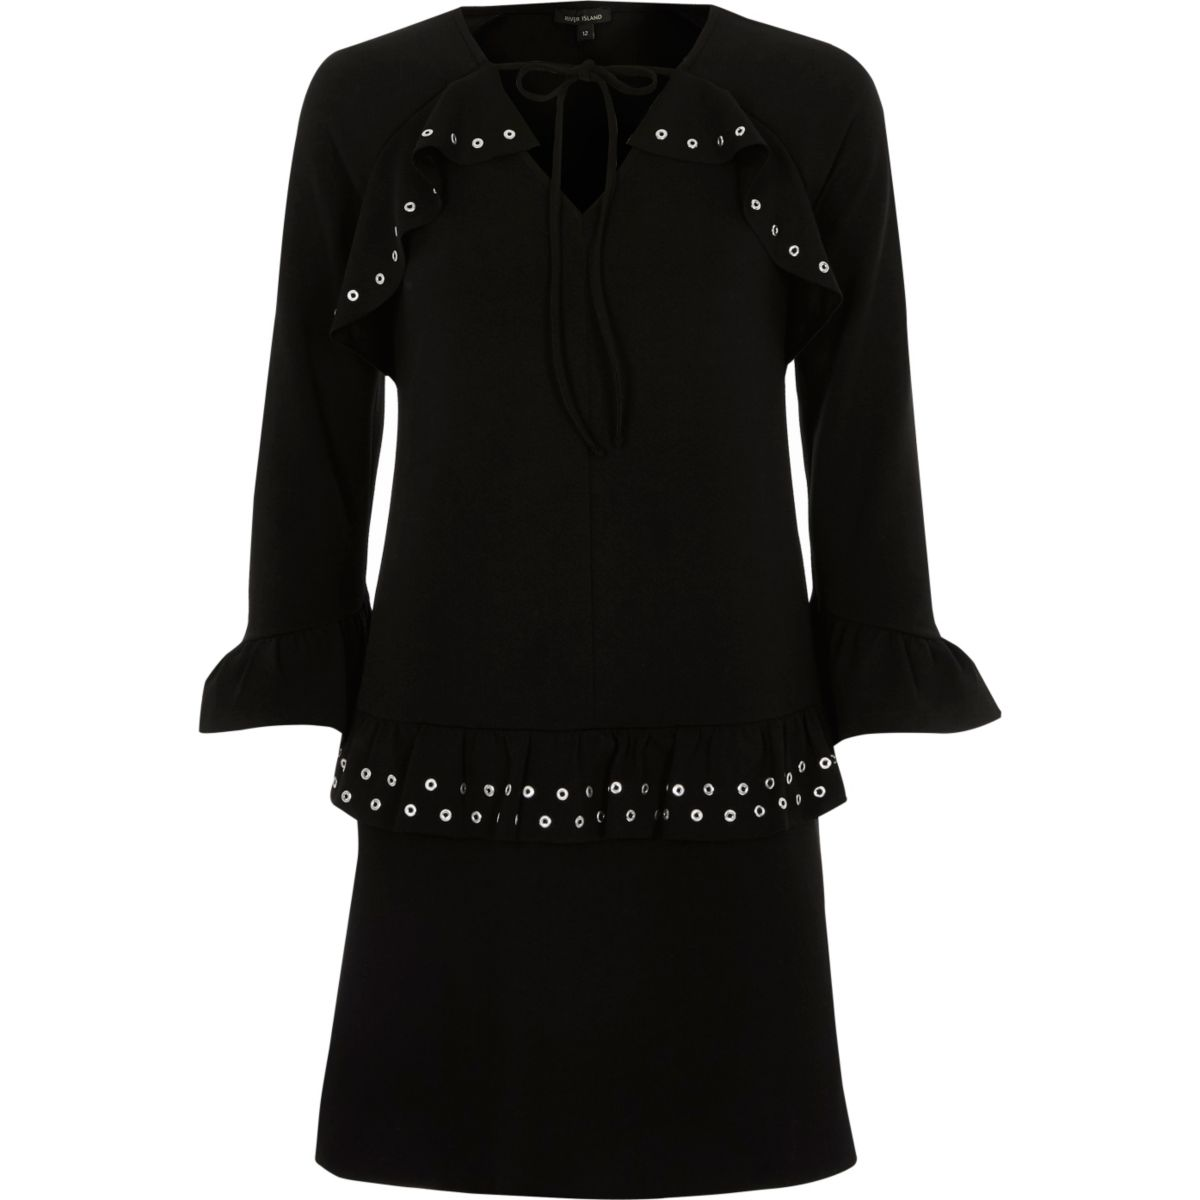 Black frill eyelet long sleeve dress